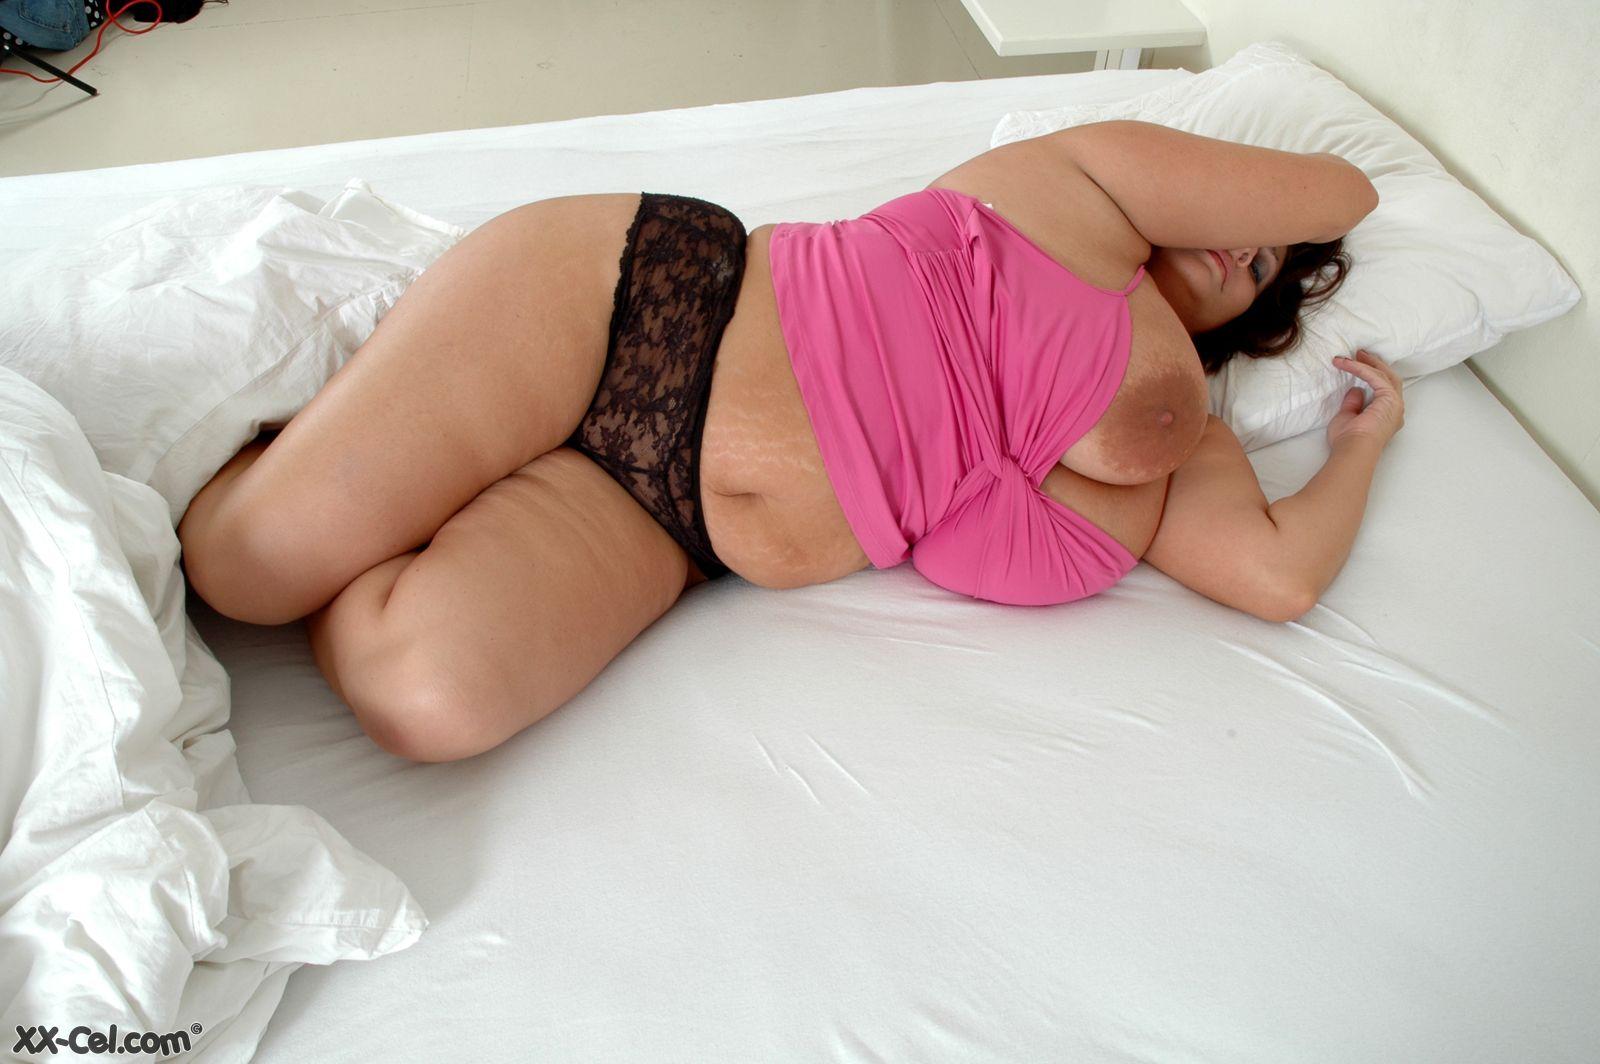 Dolly parton fake nude pics